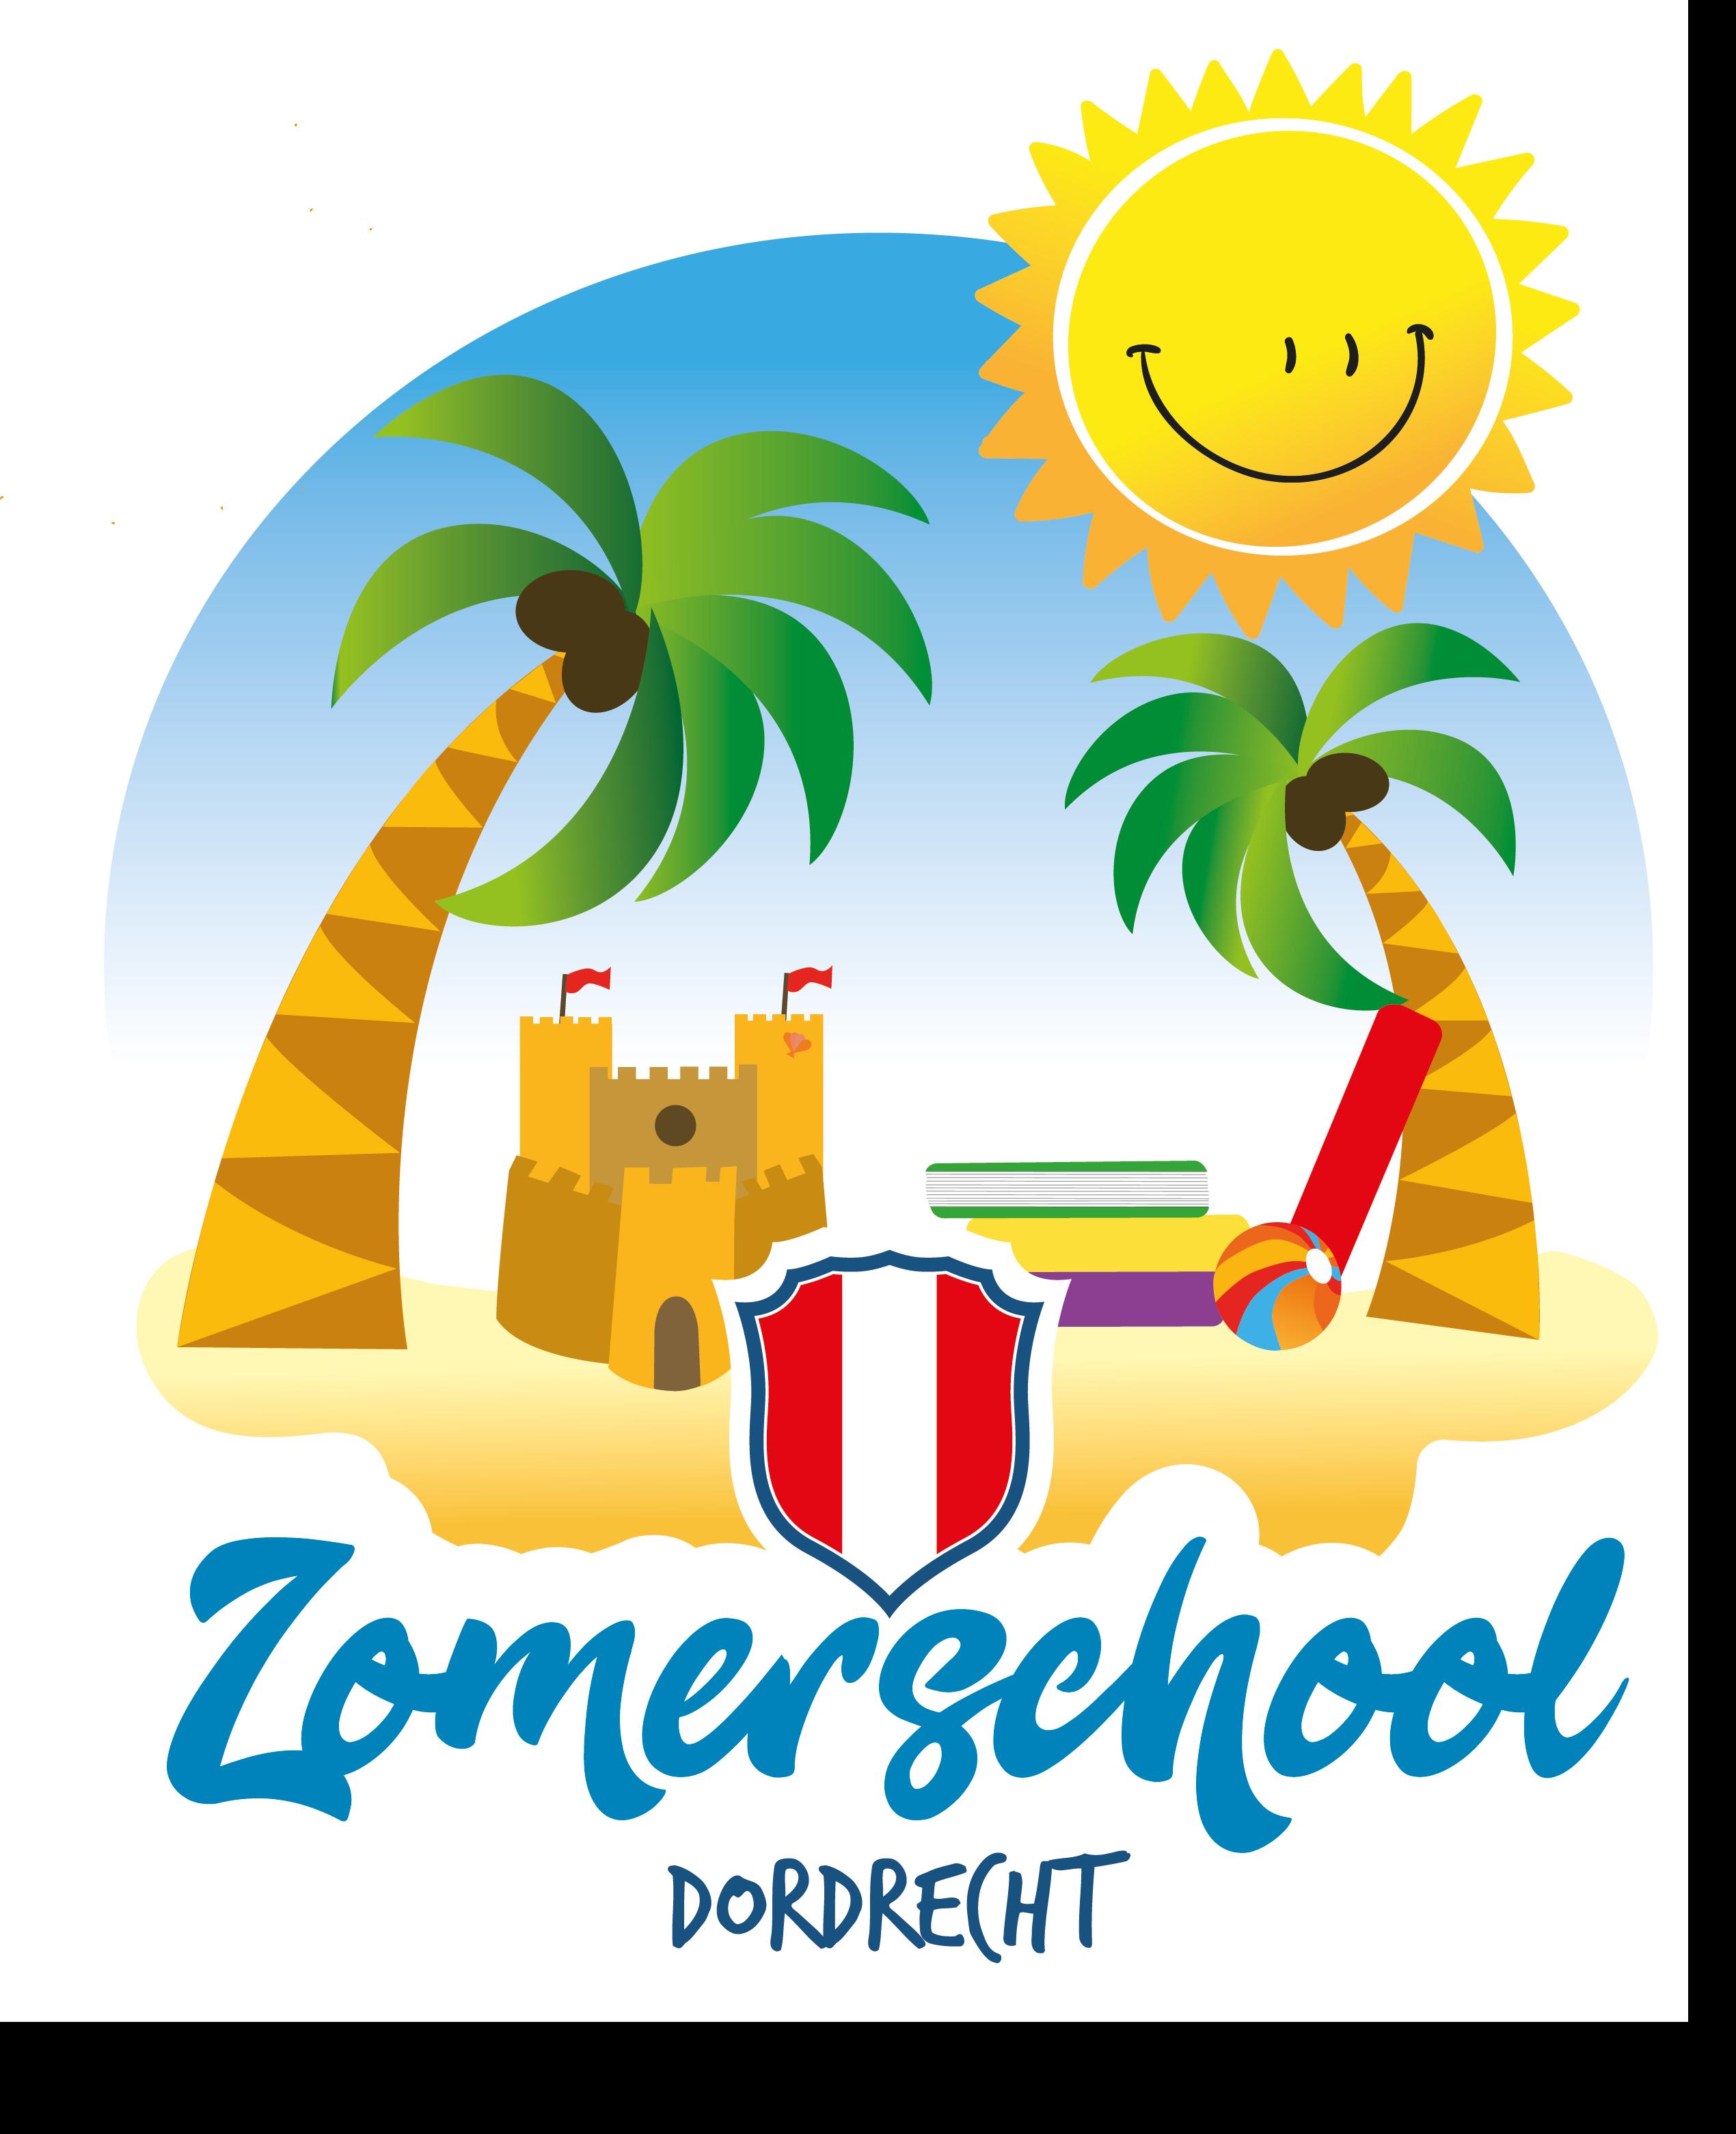 Zomerschool logo .png